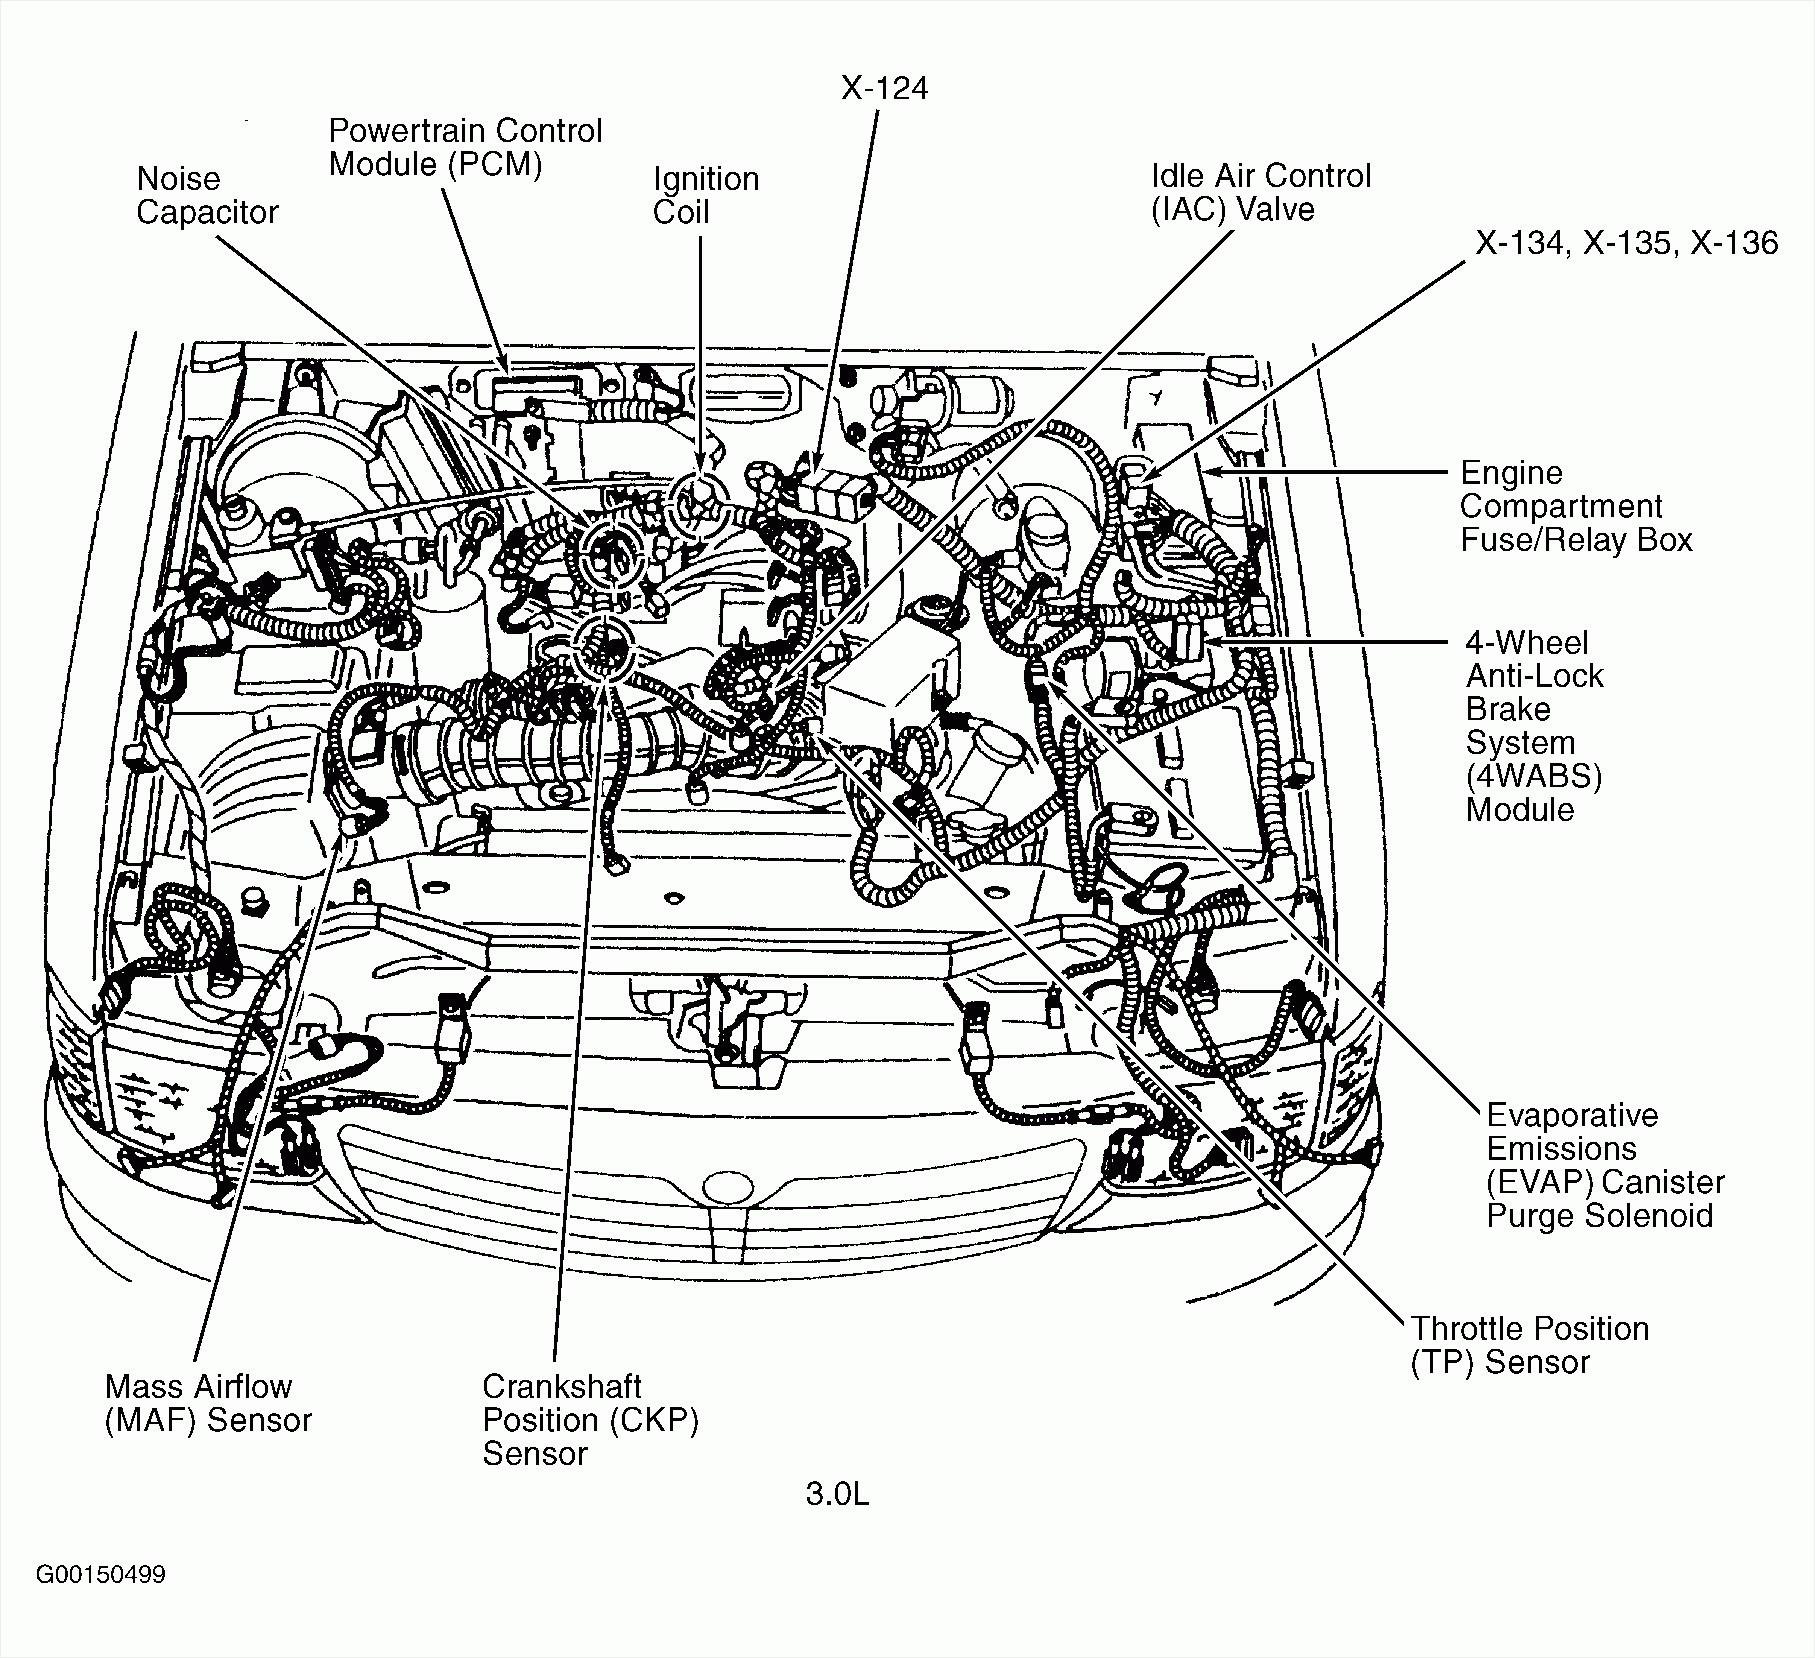 94 ford Ranger Engine Diagram ford 2 0 Engine Diagram Wiring Diagram General Of 94 ford Ranger Engine Diagram ford 3 0 Engine Diagrams Wiring Diagram Pass